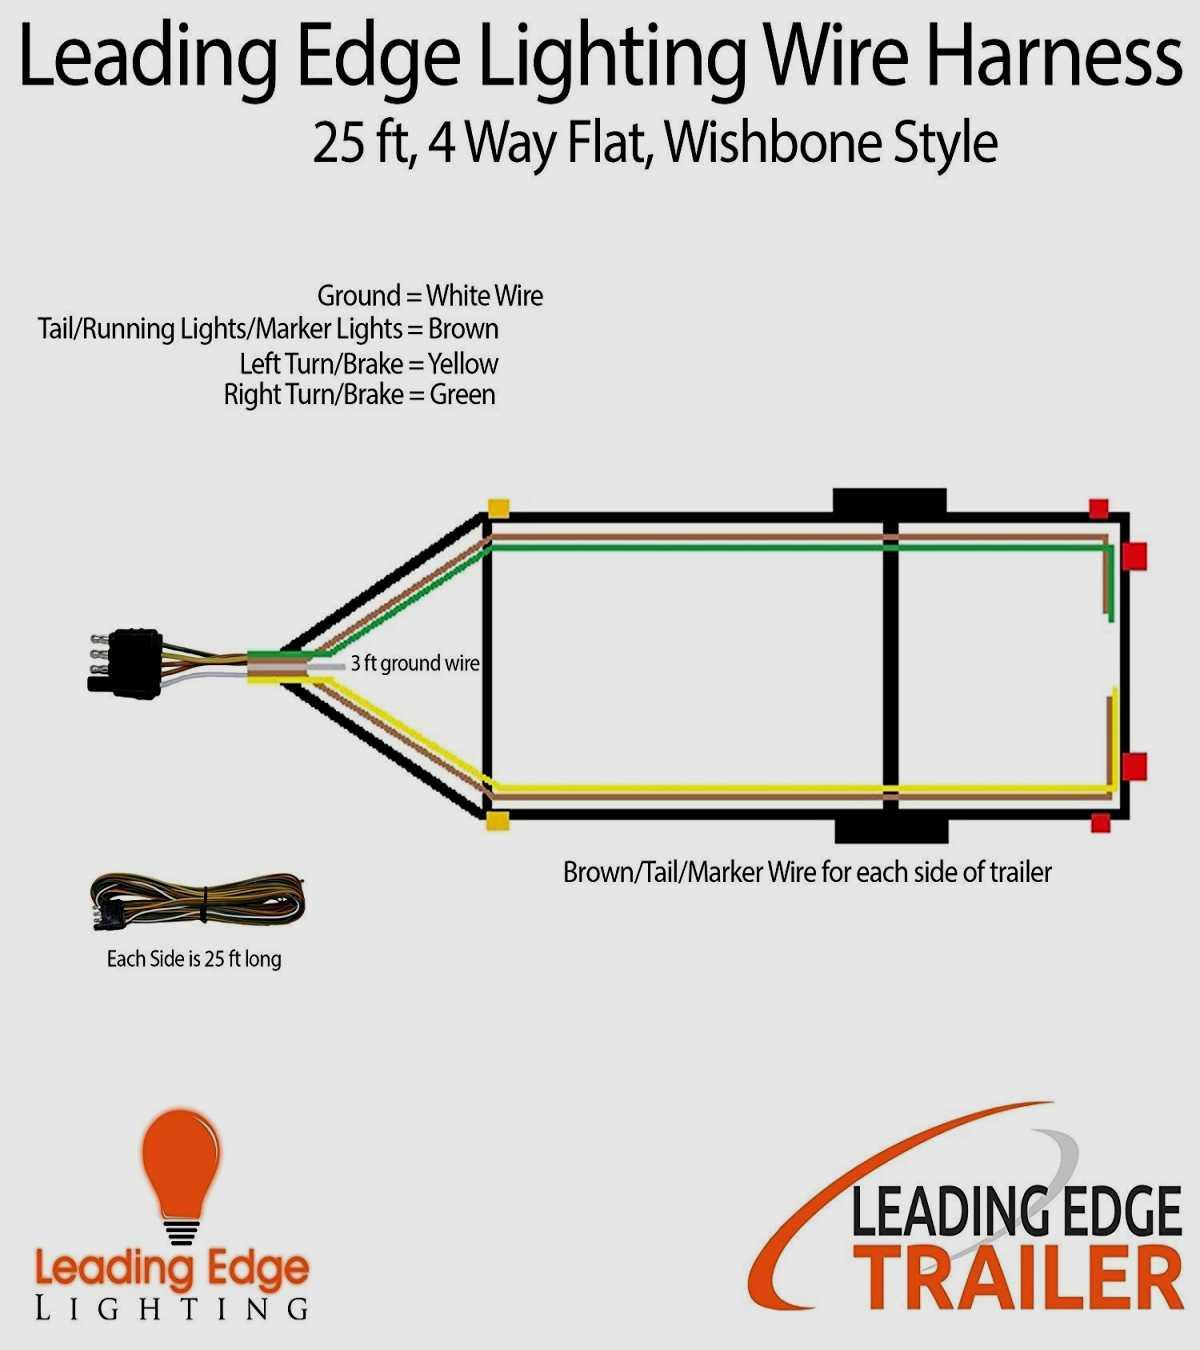 4 Prong Twist Lock Plug Wiring Diagram - Trusted Wiring Diagram Online - 3 Prong Twist Lock Plug Wiring Diagram